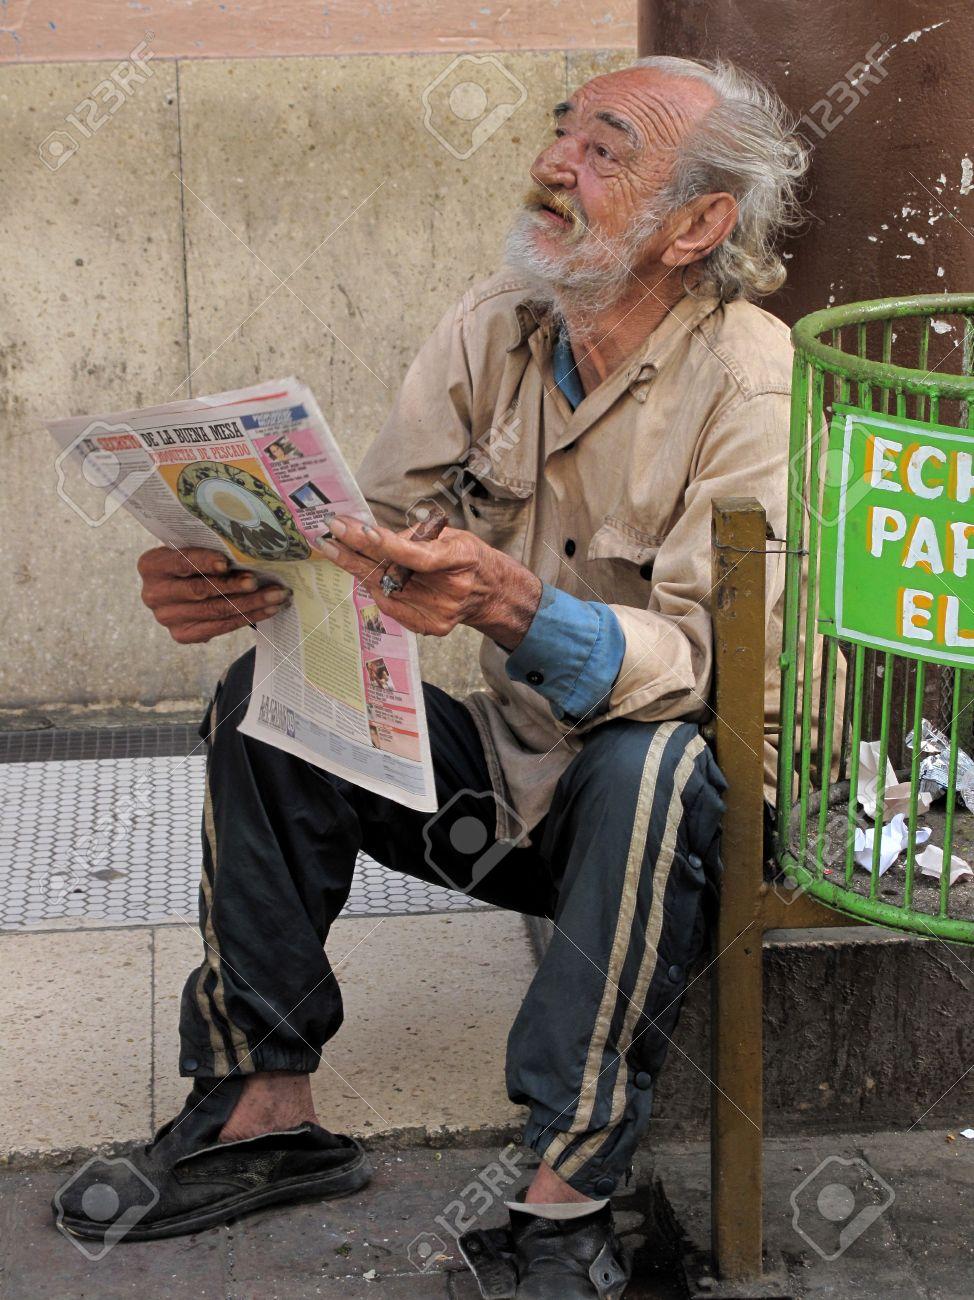 Image of: Begging Habana Cuba February 202009 Poor Old Man Alone In The 123rfcom Habana Cuba February 202009 Poor Old Man Alone In The Stock